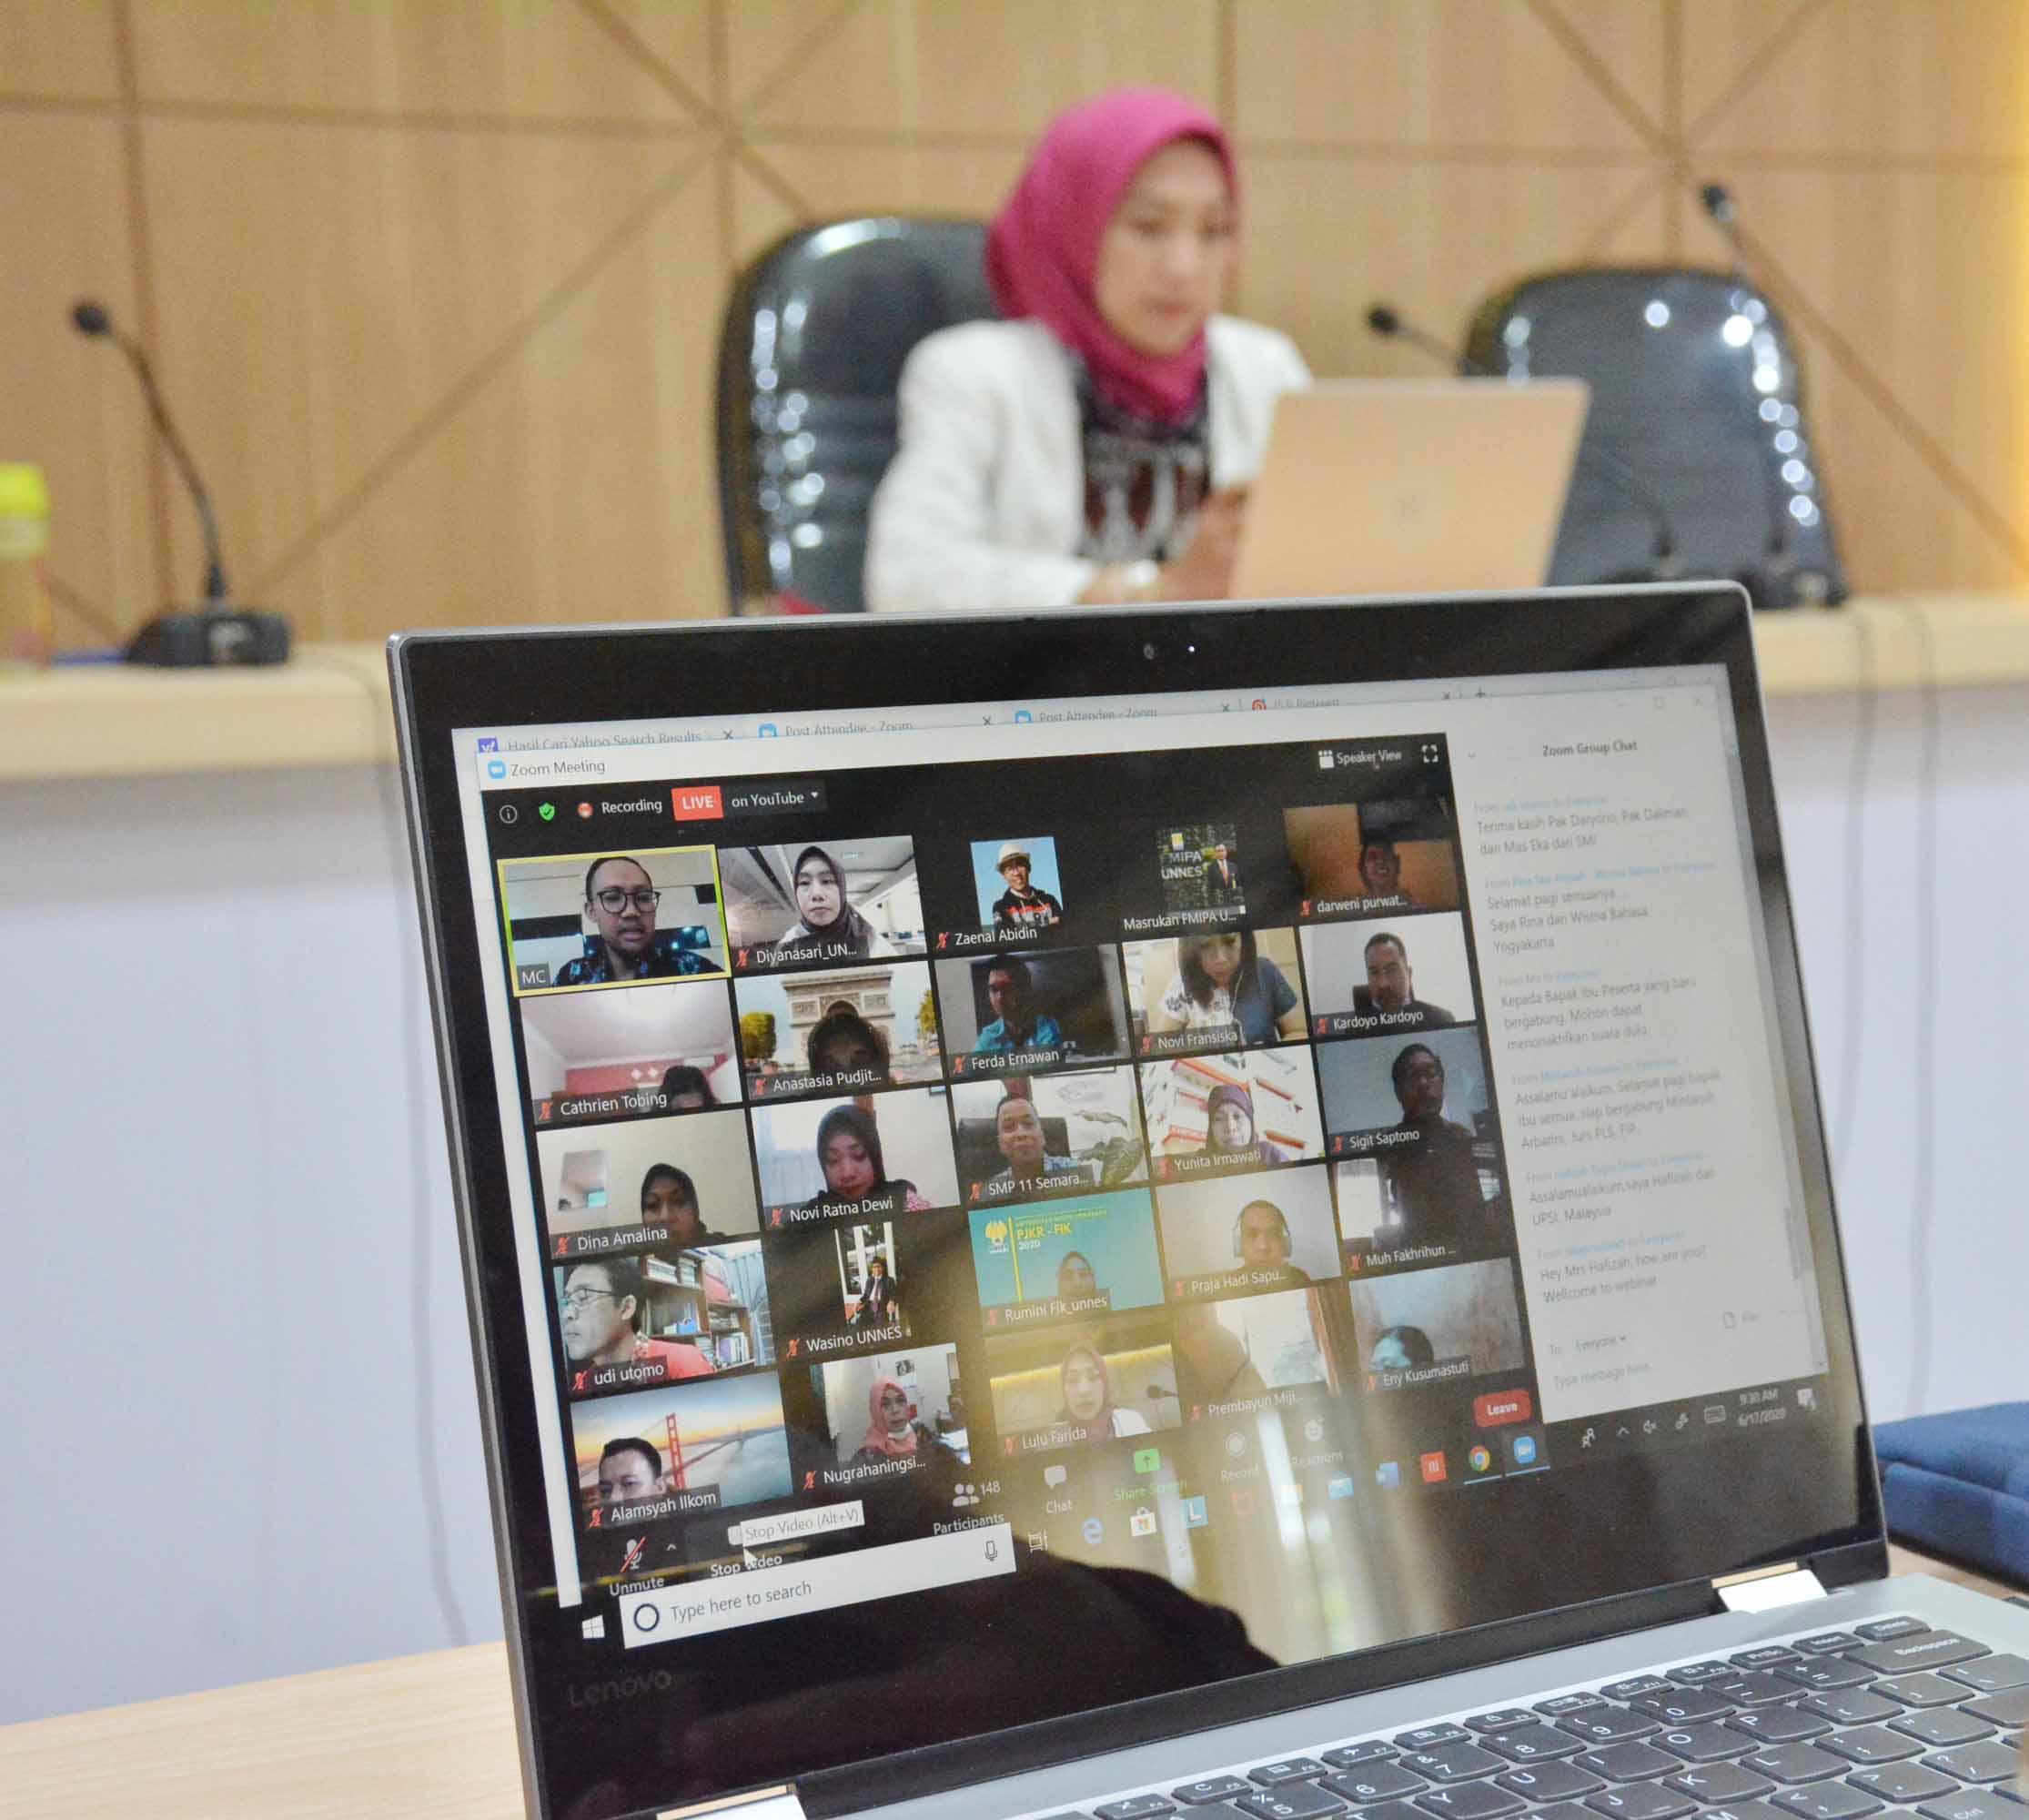 Webinar International Office UNNES : Effective Strategies in Strengthening Succsessfull Partnership for Autonomous Campus Implementation